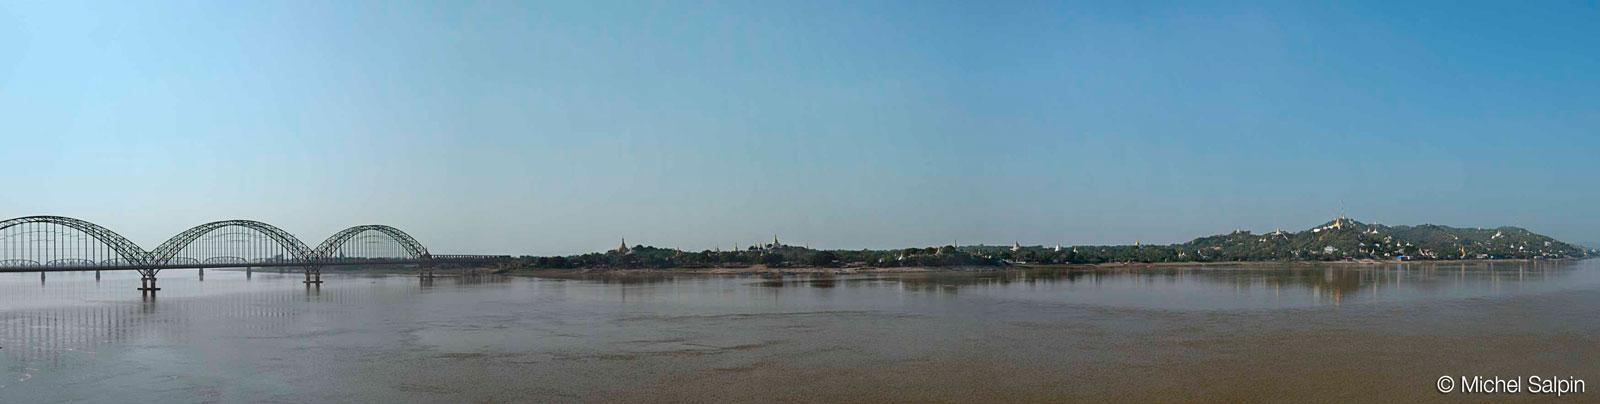 Environs de Mandalay en Birmanie - Myanmar